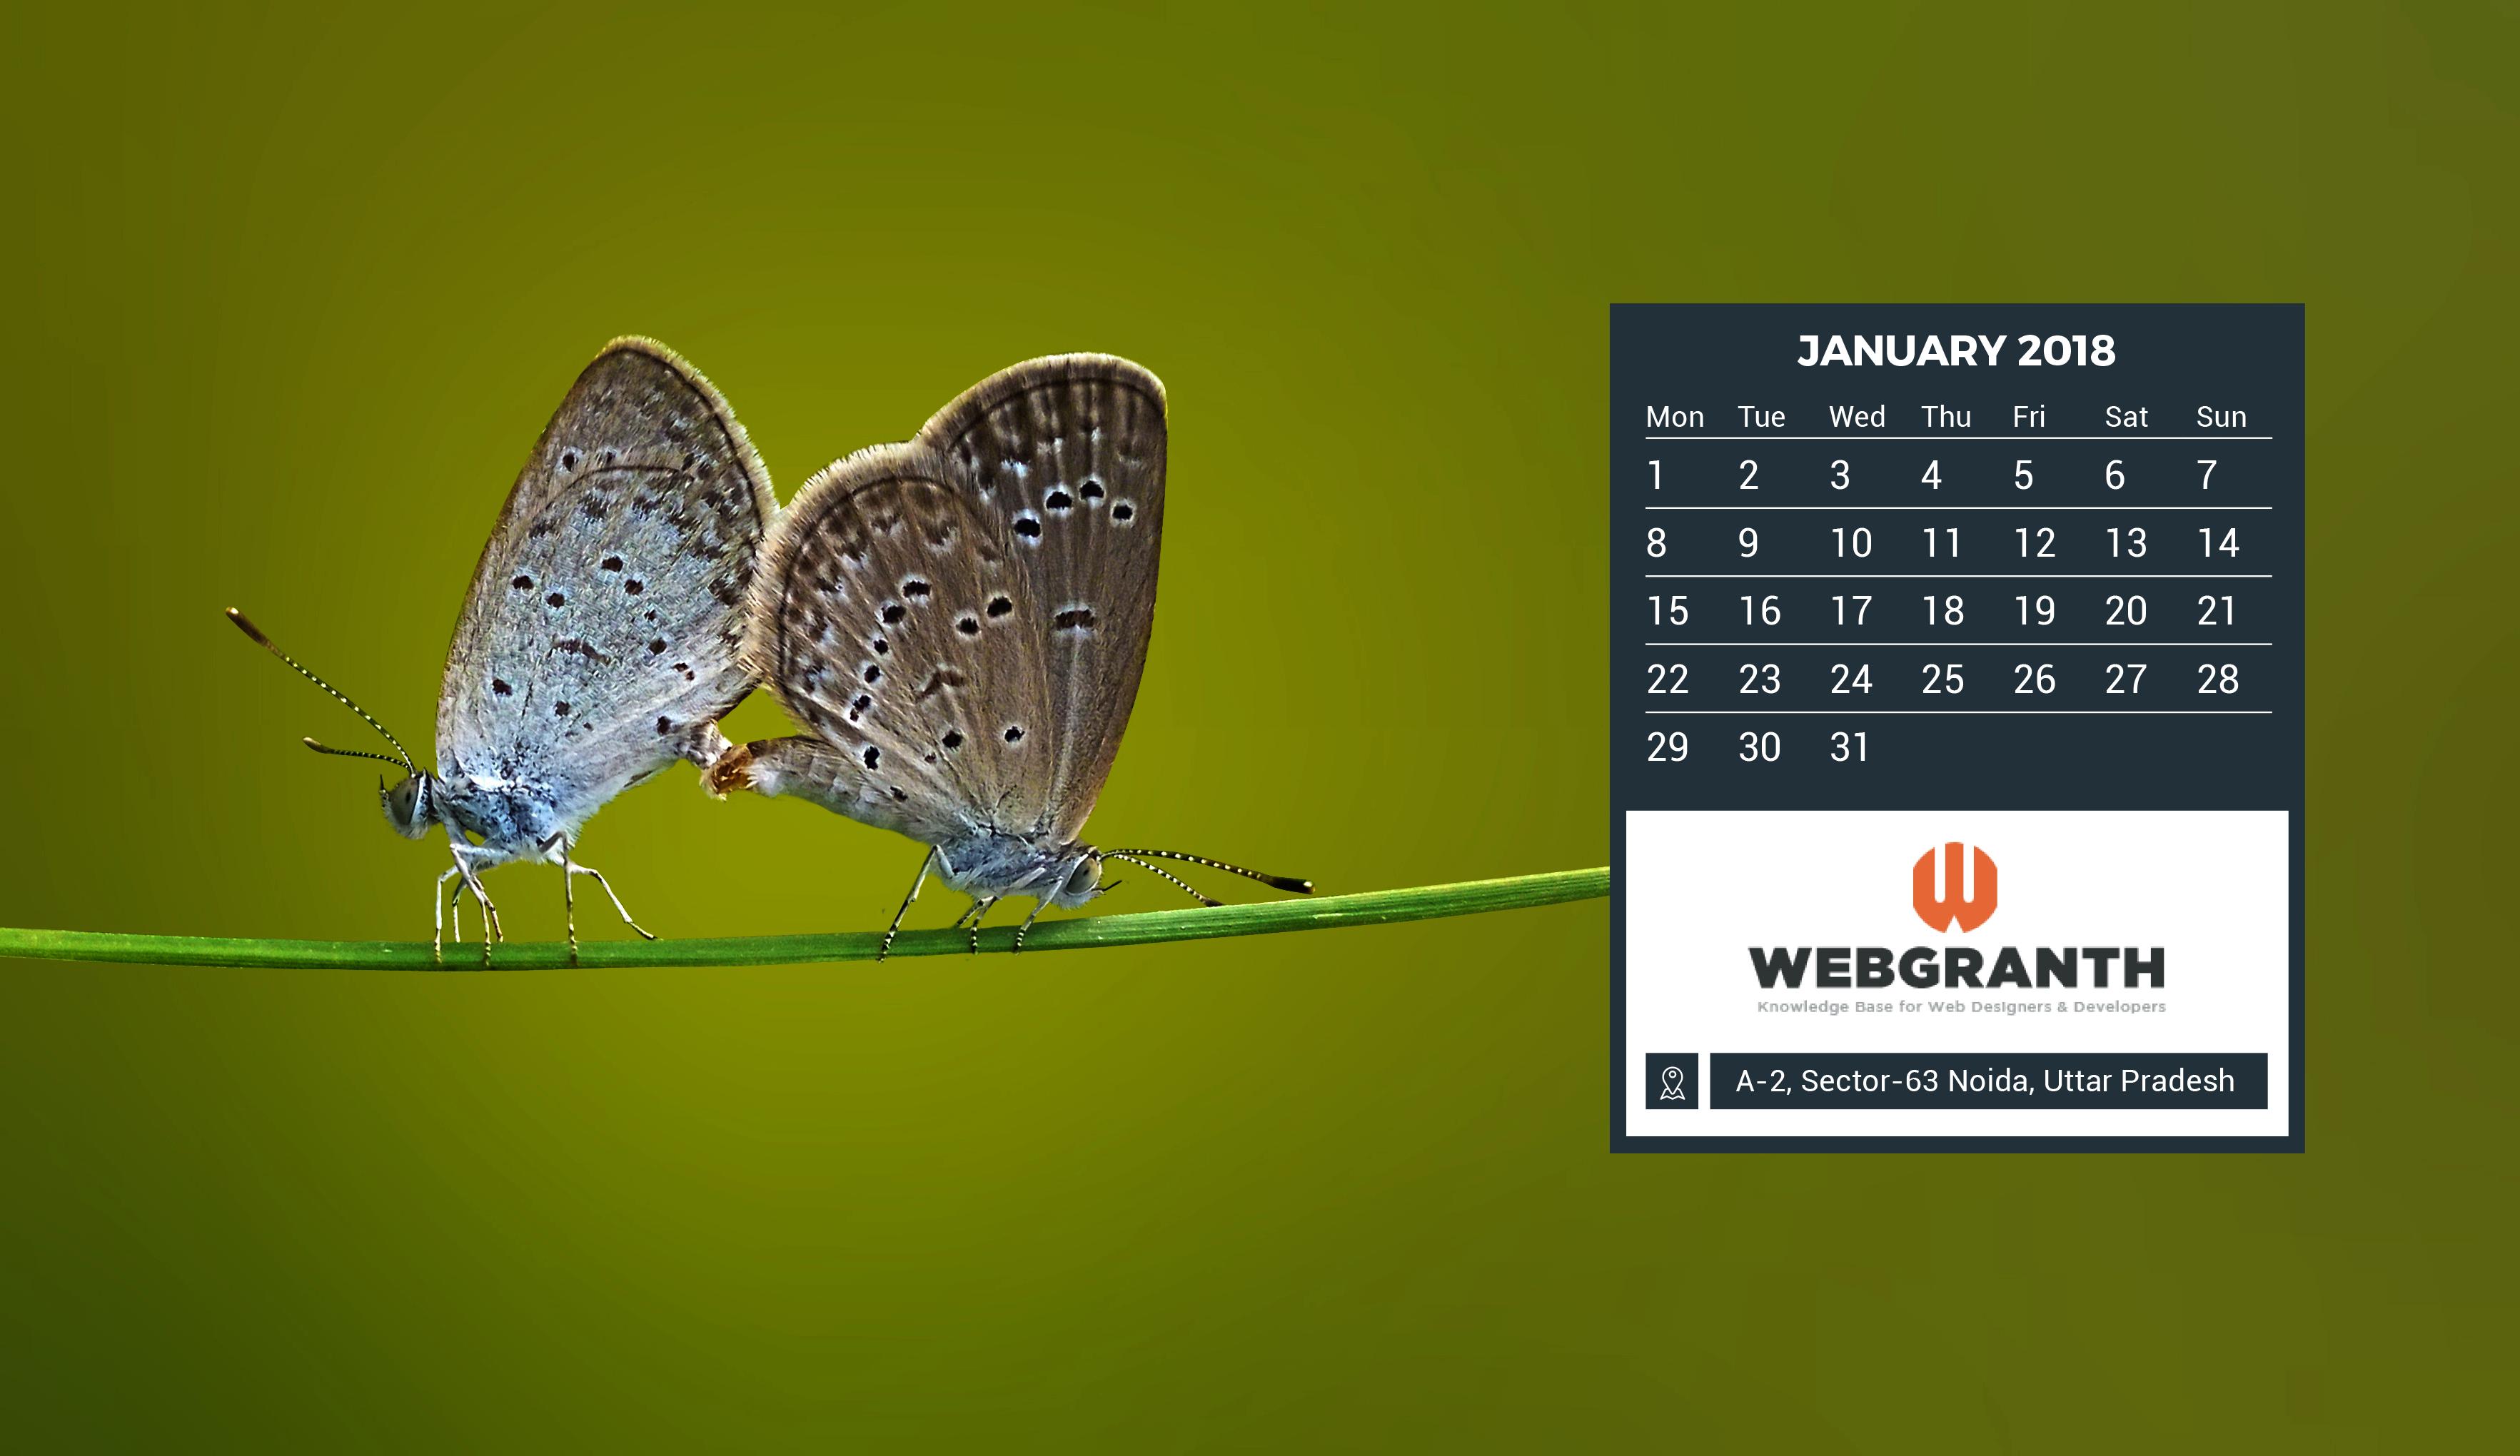 Wallpaper Calendar 2018: Download 2018 Calendar Wallpaper Free ...